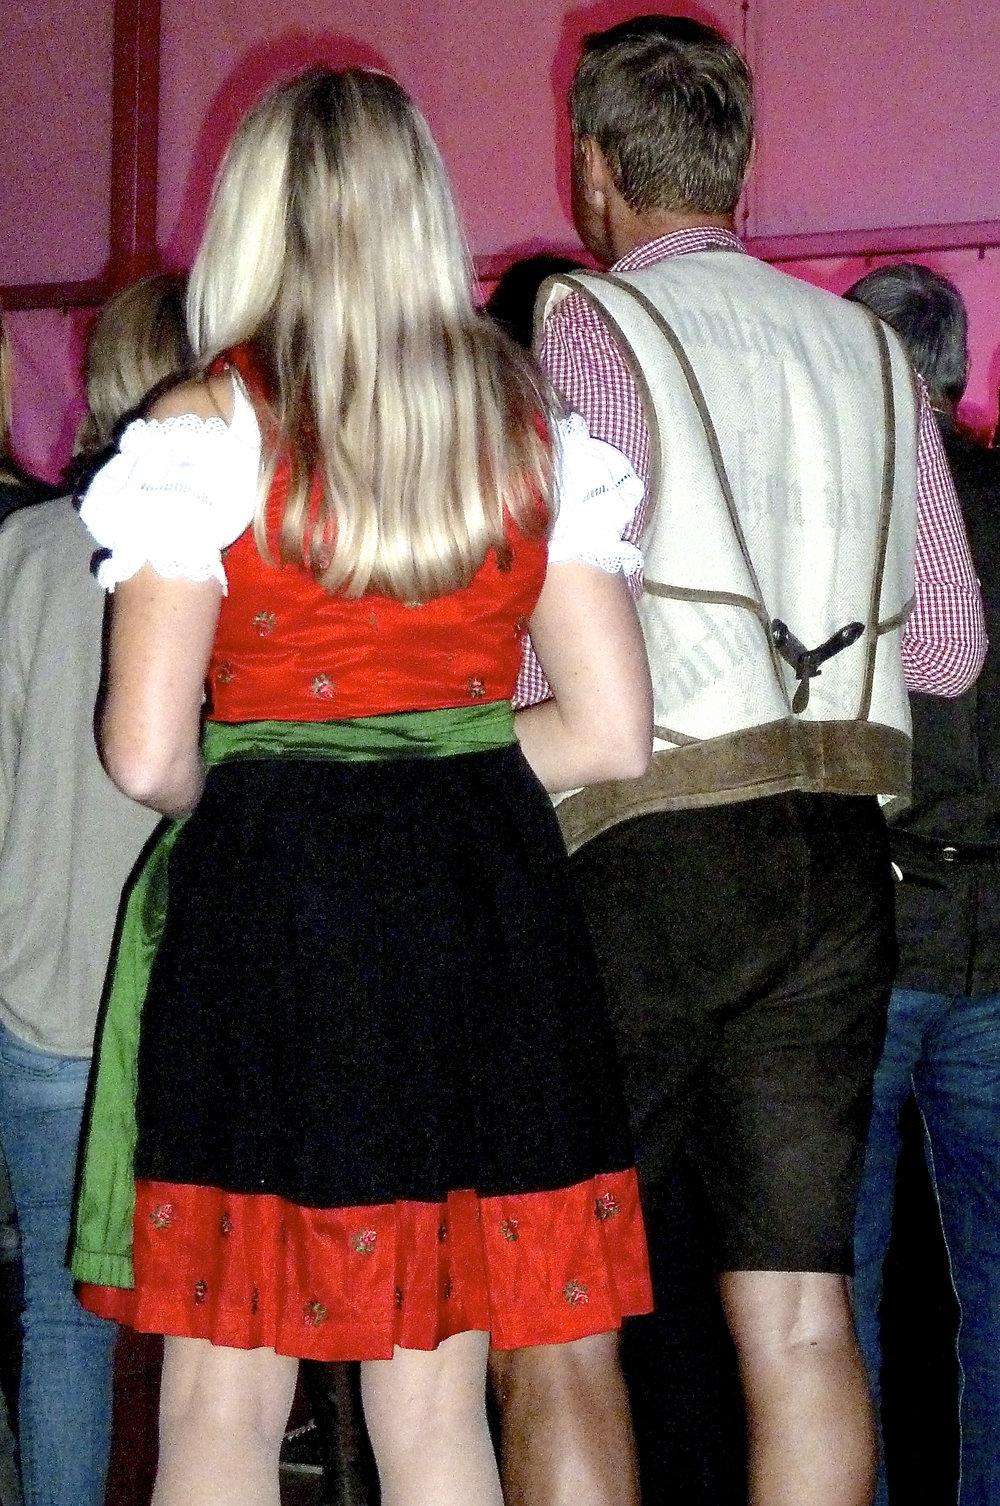 cindi_Oktoberfest_Fontana_Austria_spiritedtable_photo.2.jpg